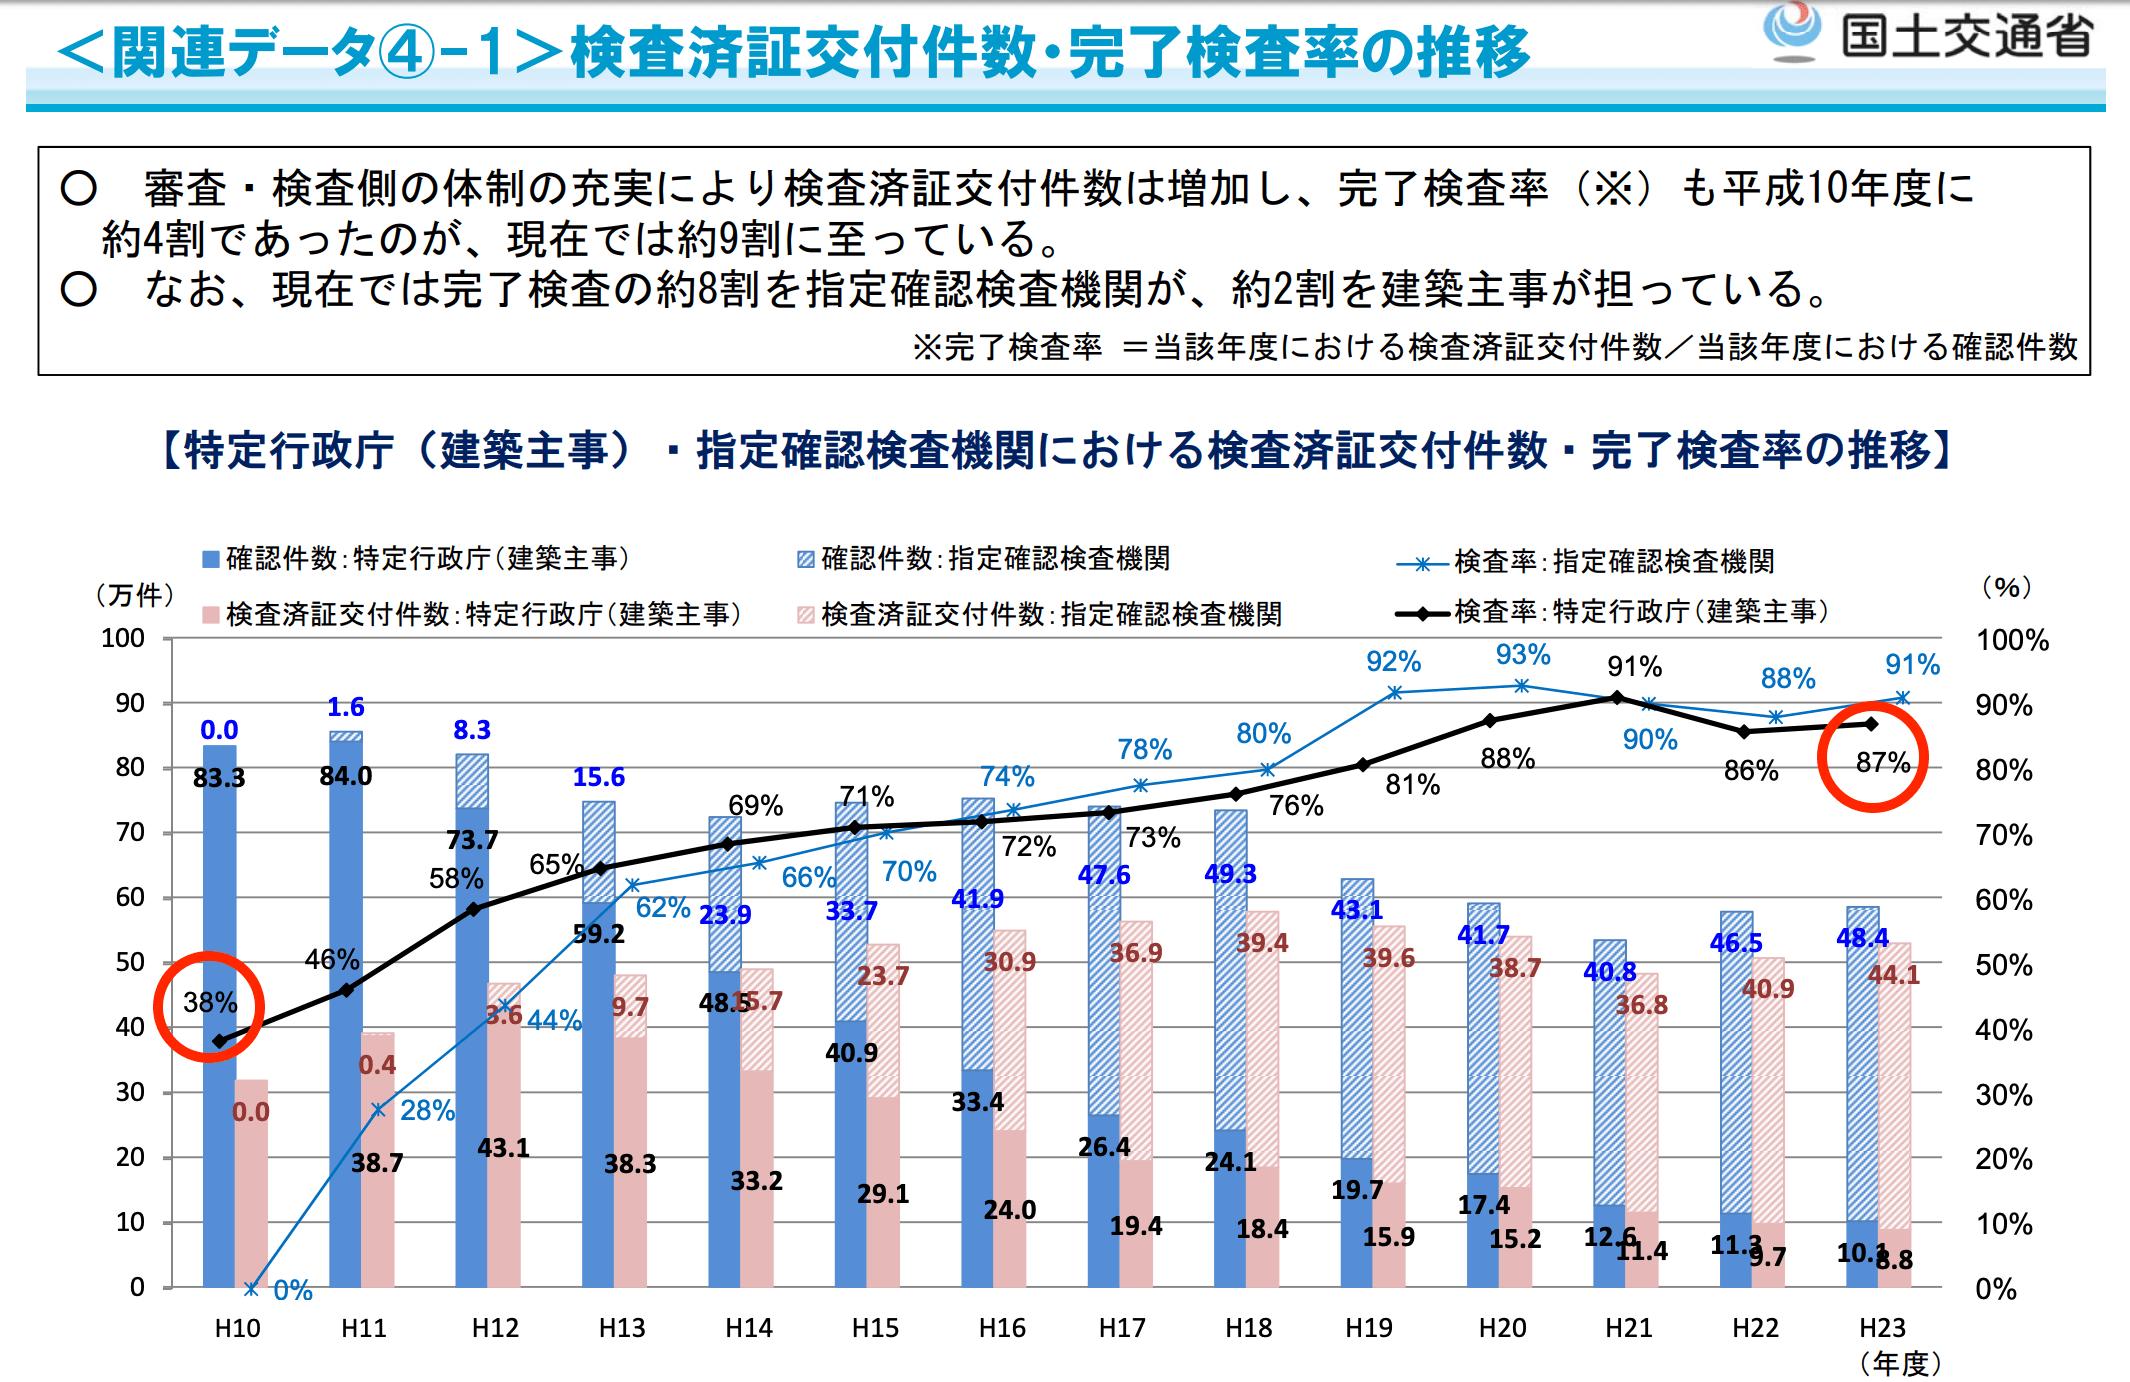 完了検査率の推移(国土交通省より)